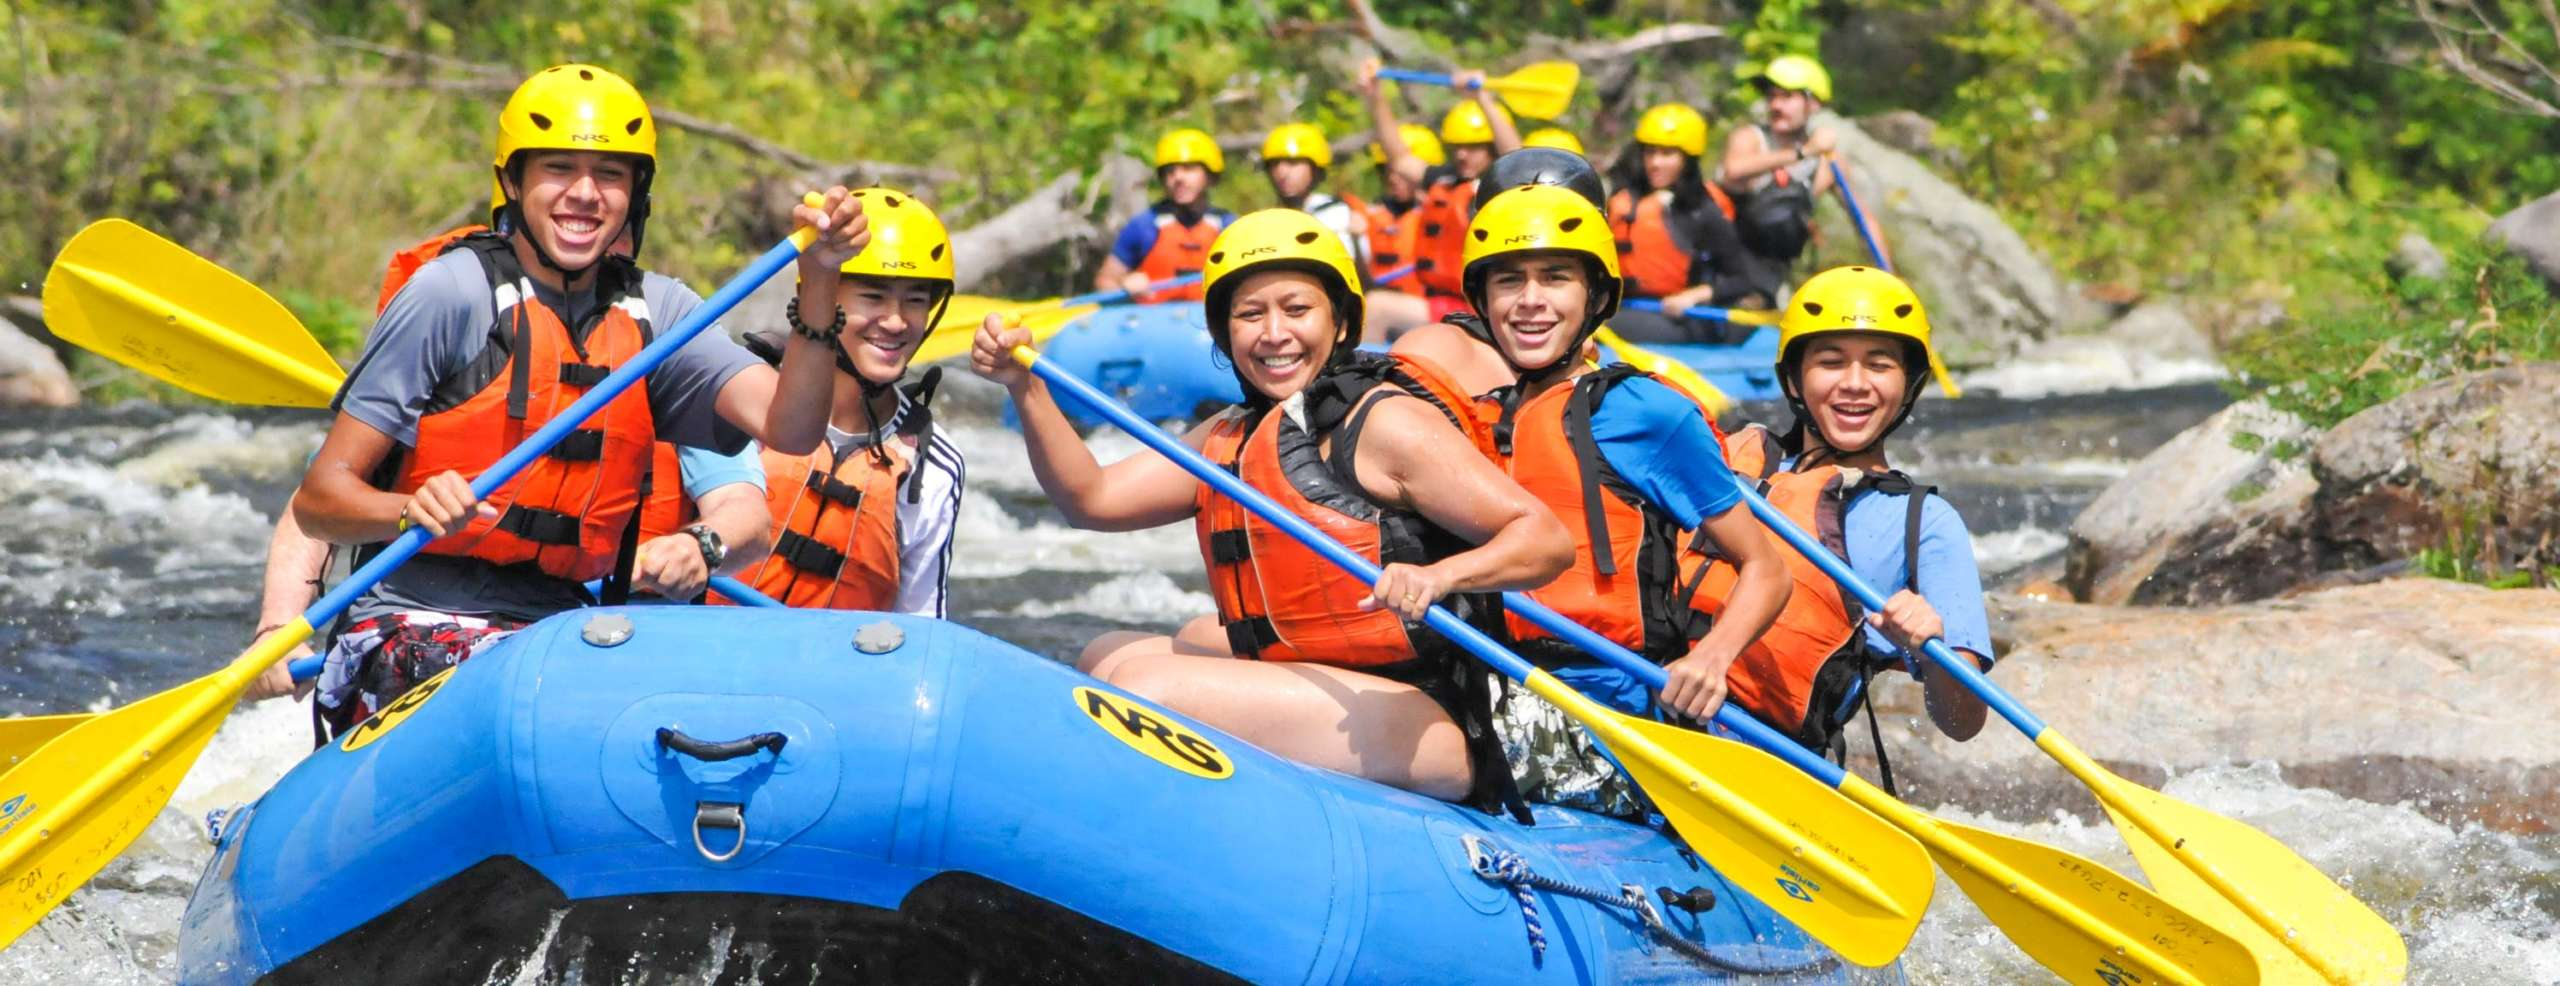 Group of rafters having fun navigating rapids